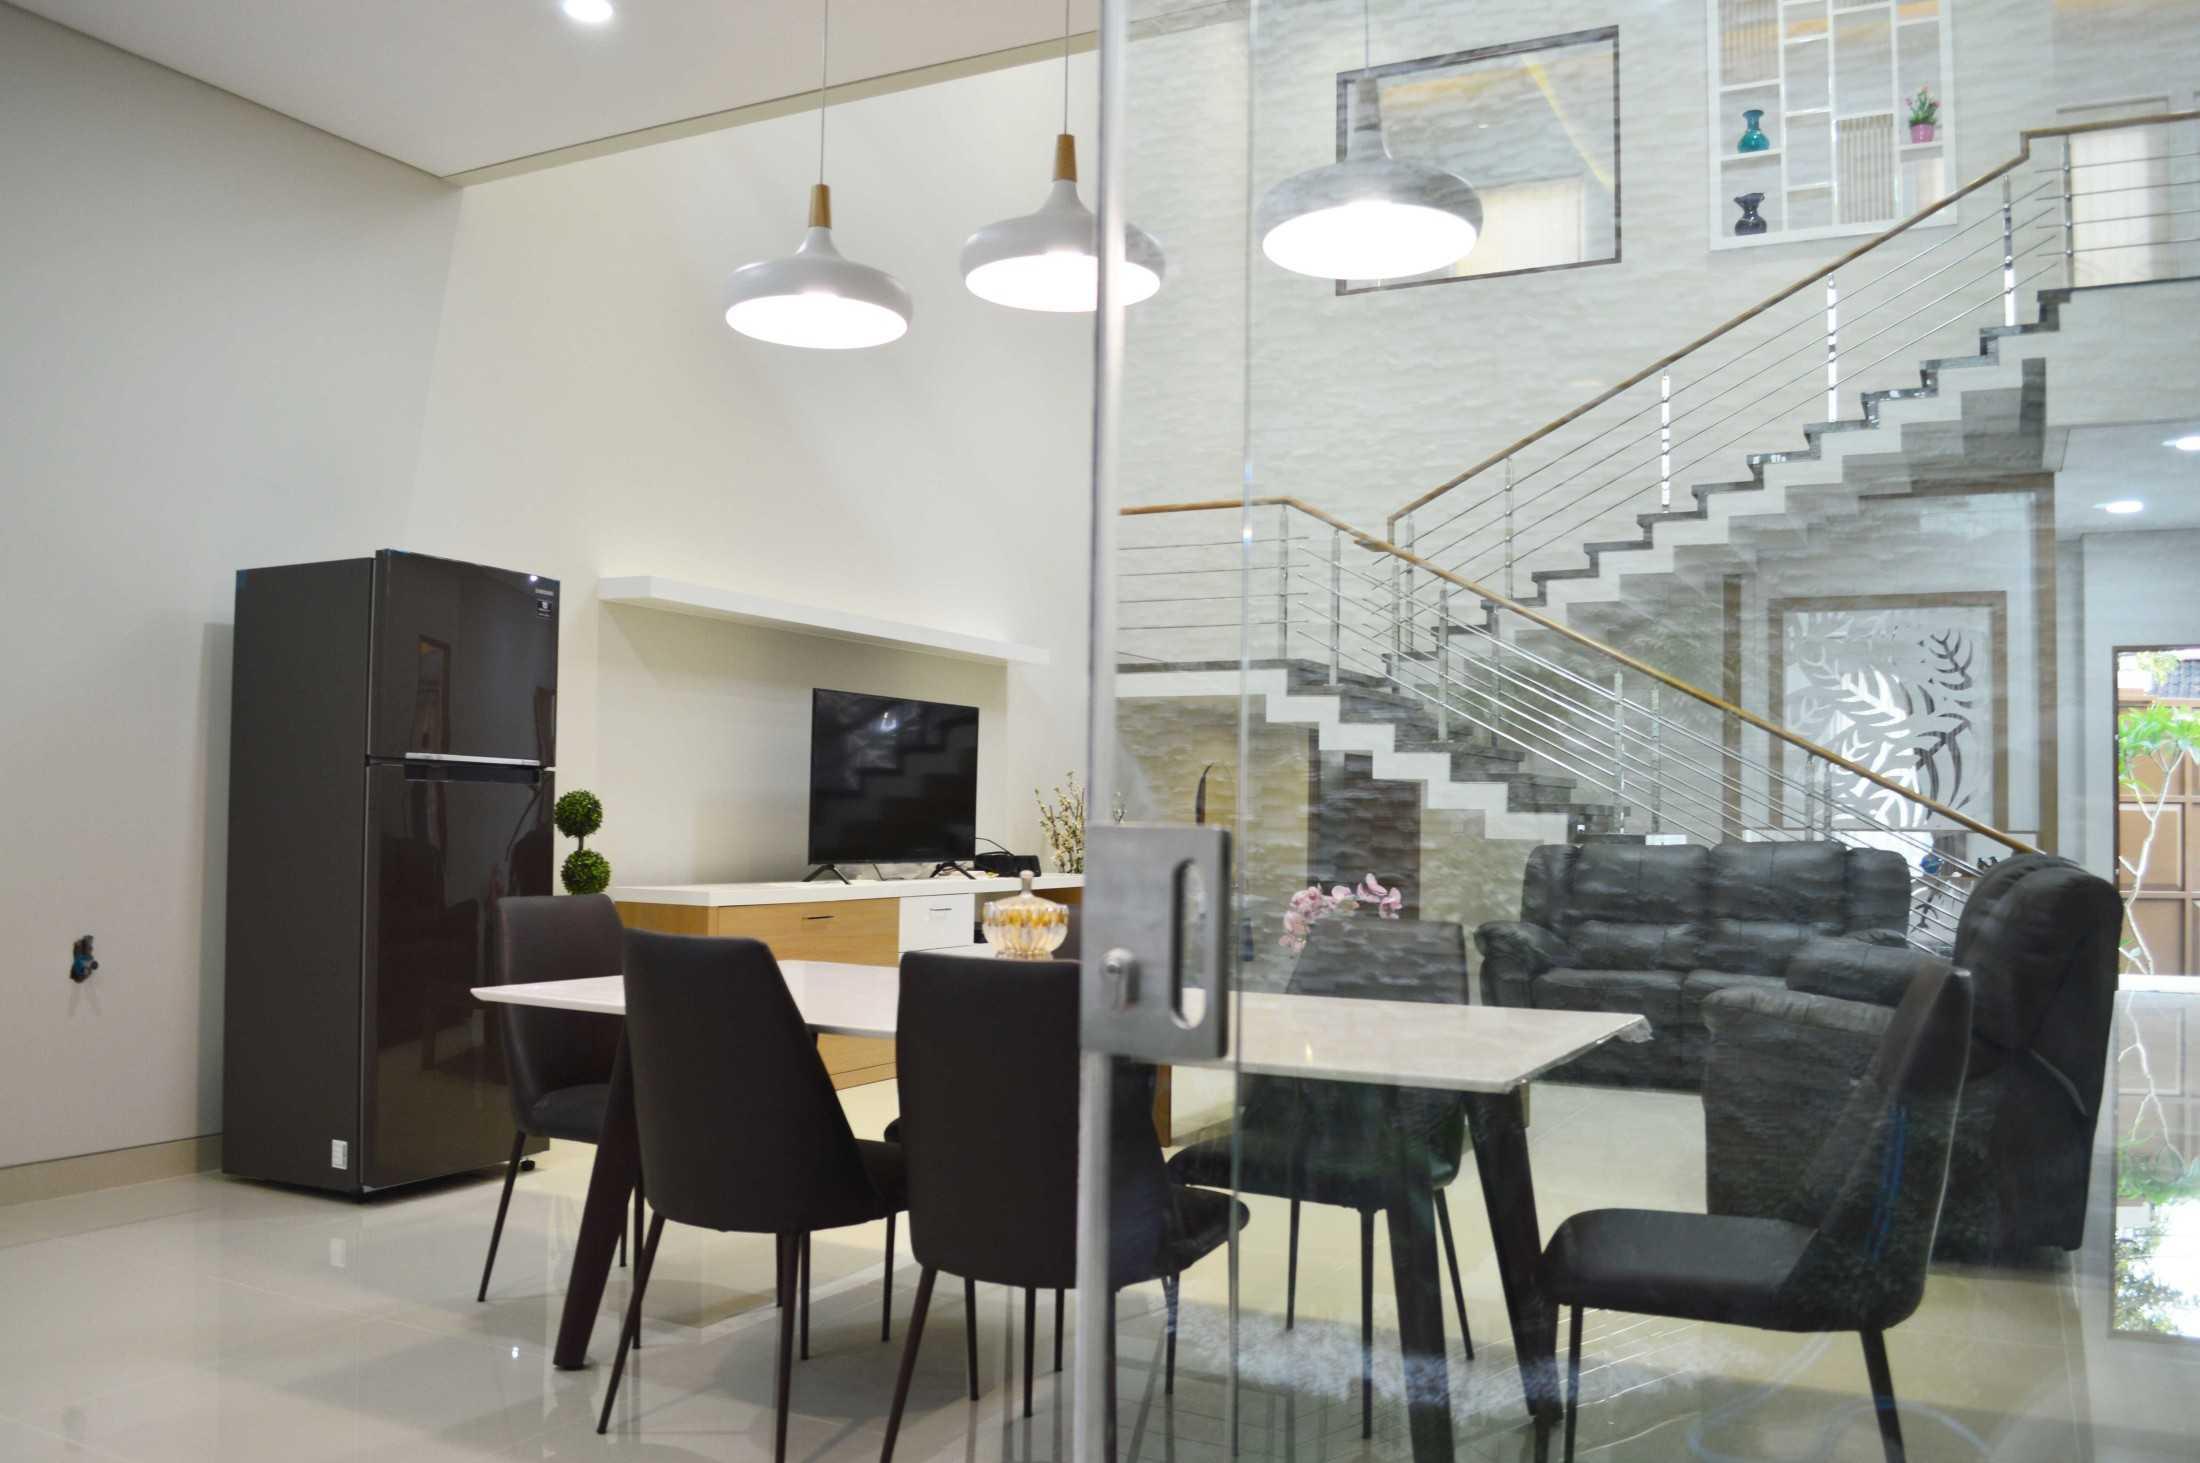 Conarch Studio Modern House With Natural Color Palette Surakarta, Kota Surakarta, Jawa Tengah, Indonesia Surakarta, Kota Surakarta, Jawa Tengah, Indonesia Living Room & Dining Room  122993